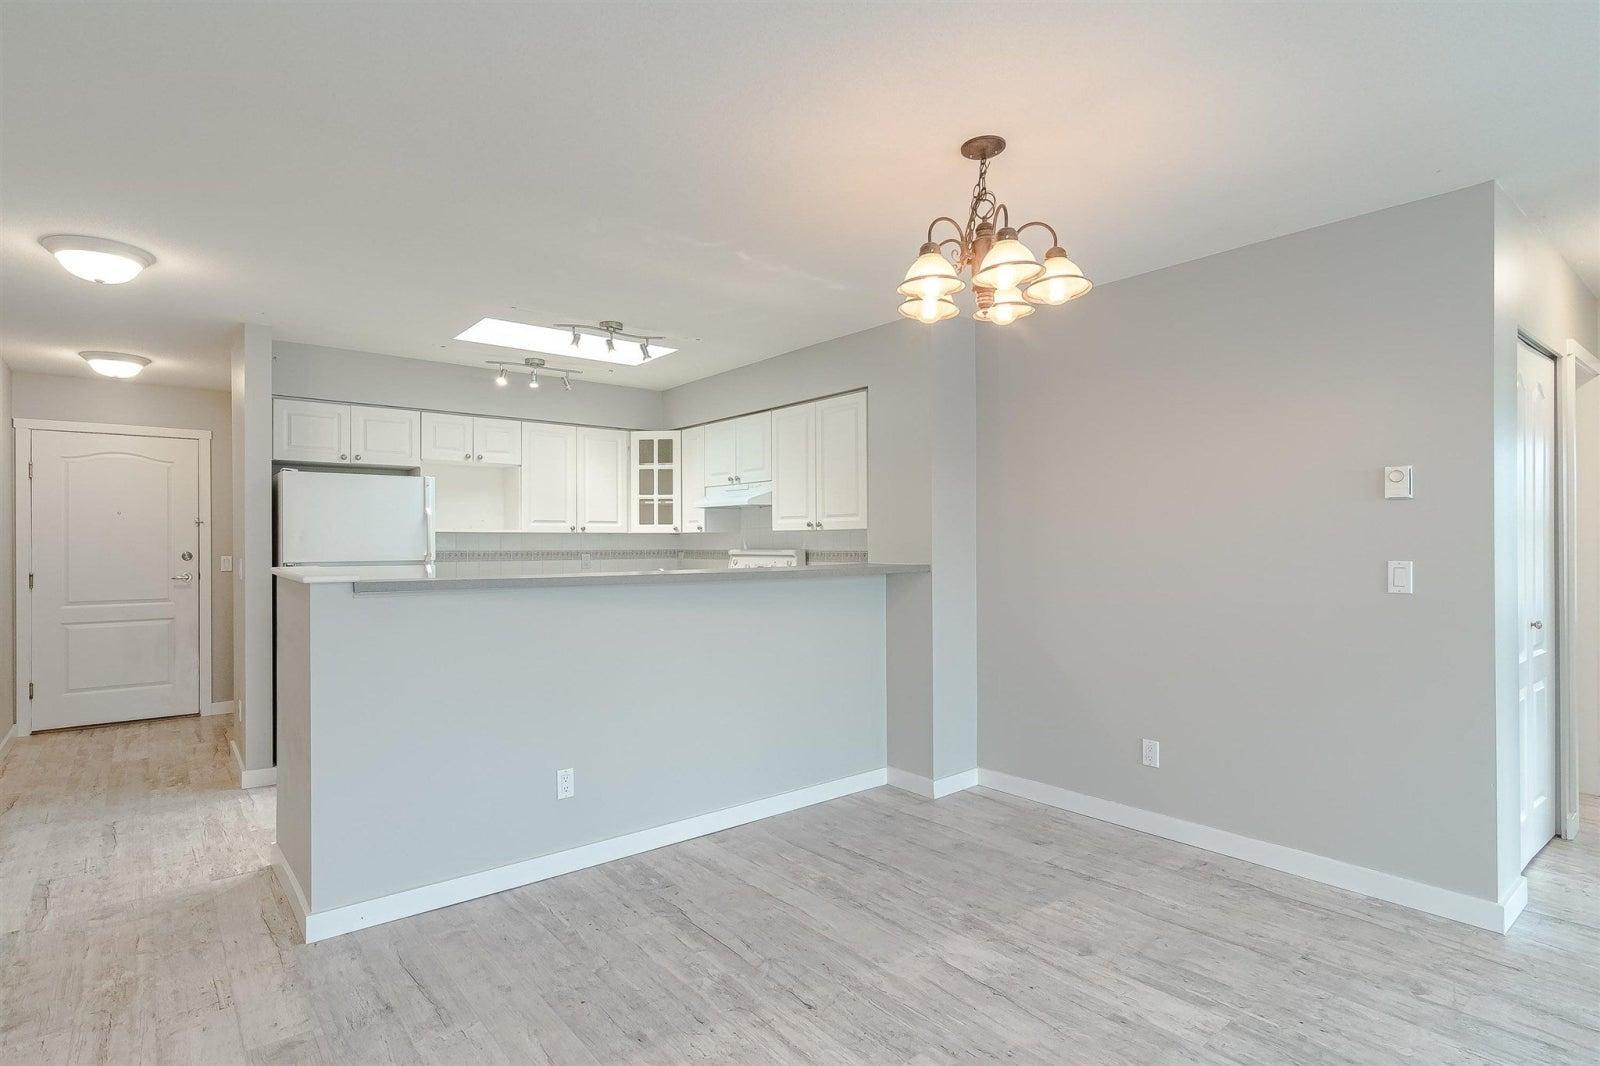 405 20268 54 AVENUE - Langley City Apartment/Condo for sale, 2 Bedrooms (R2604183) #3